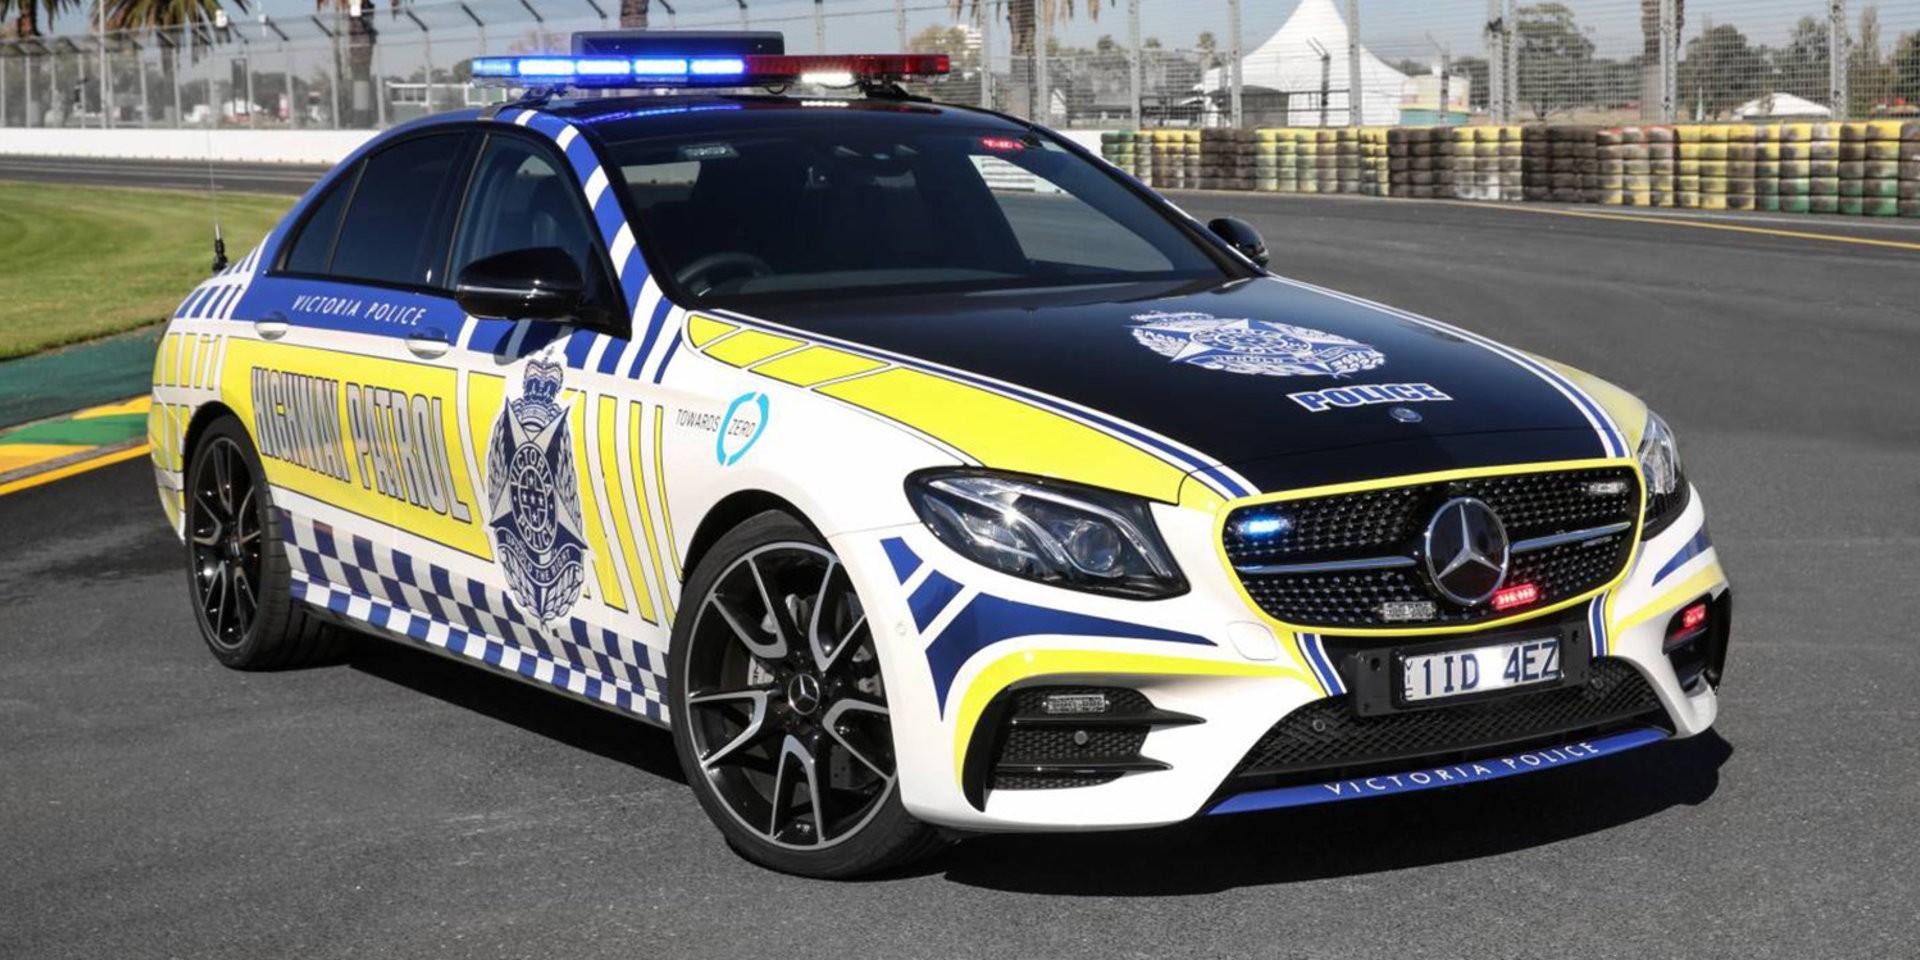 Dubai Police Supercars Explained The Full Story